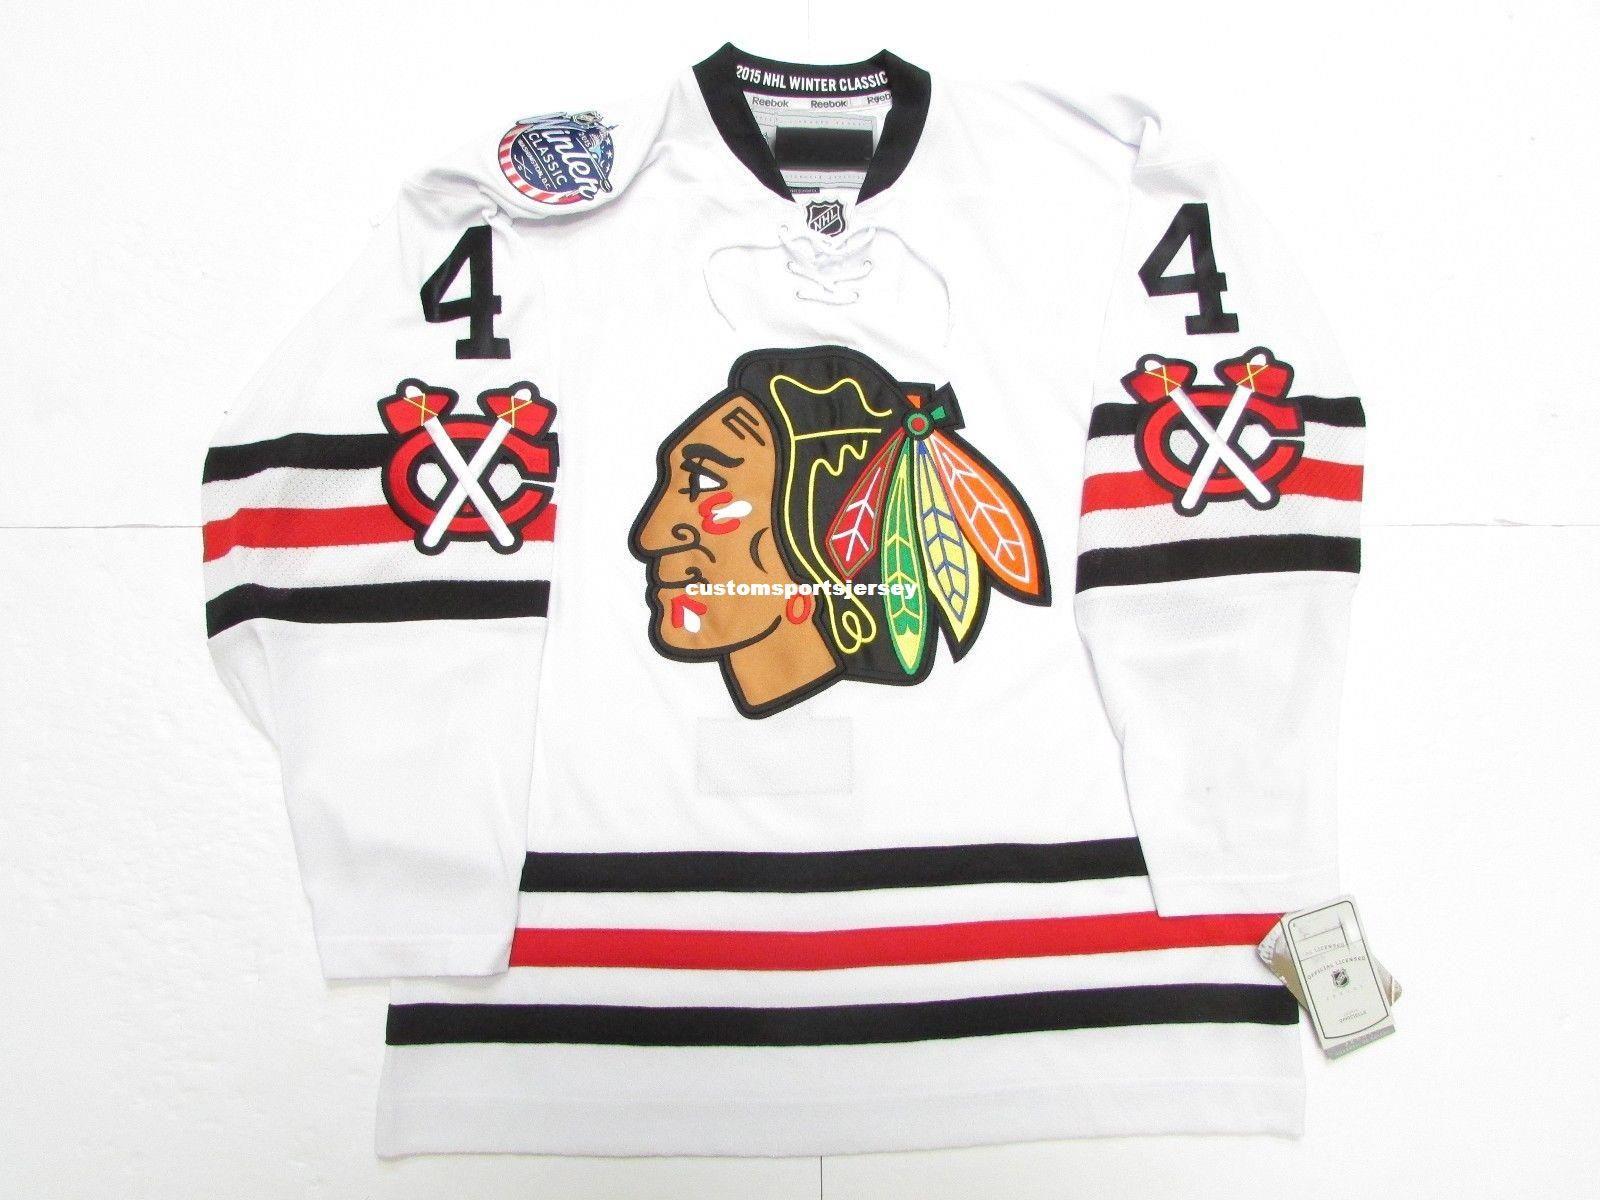 ... 2018 cheap custom hjalmarsson chicago blackhawks 2015 winter classic jersey  stitch add any number an 55b07cfad